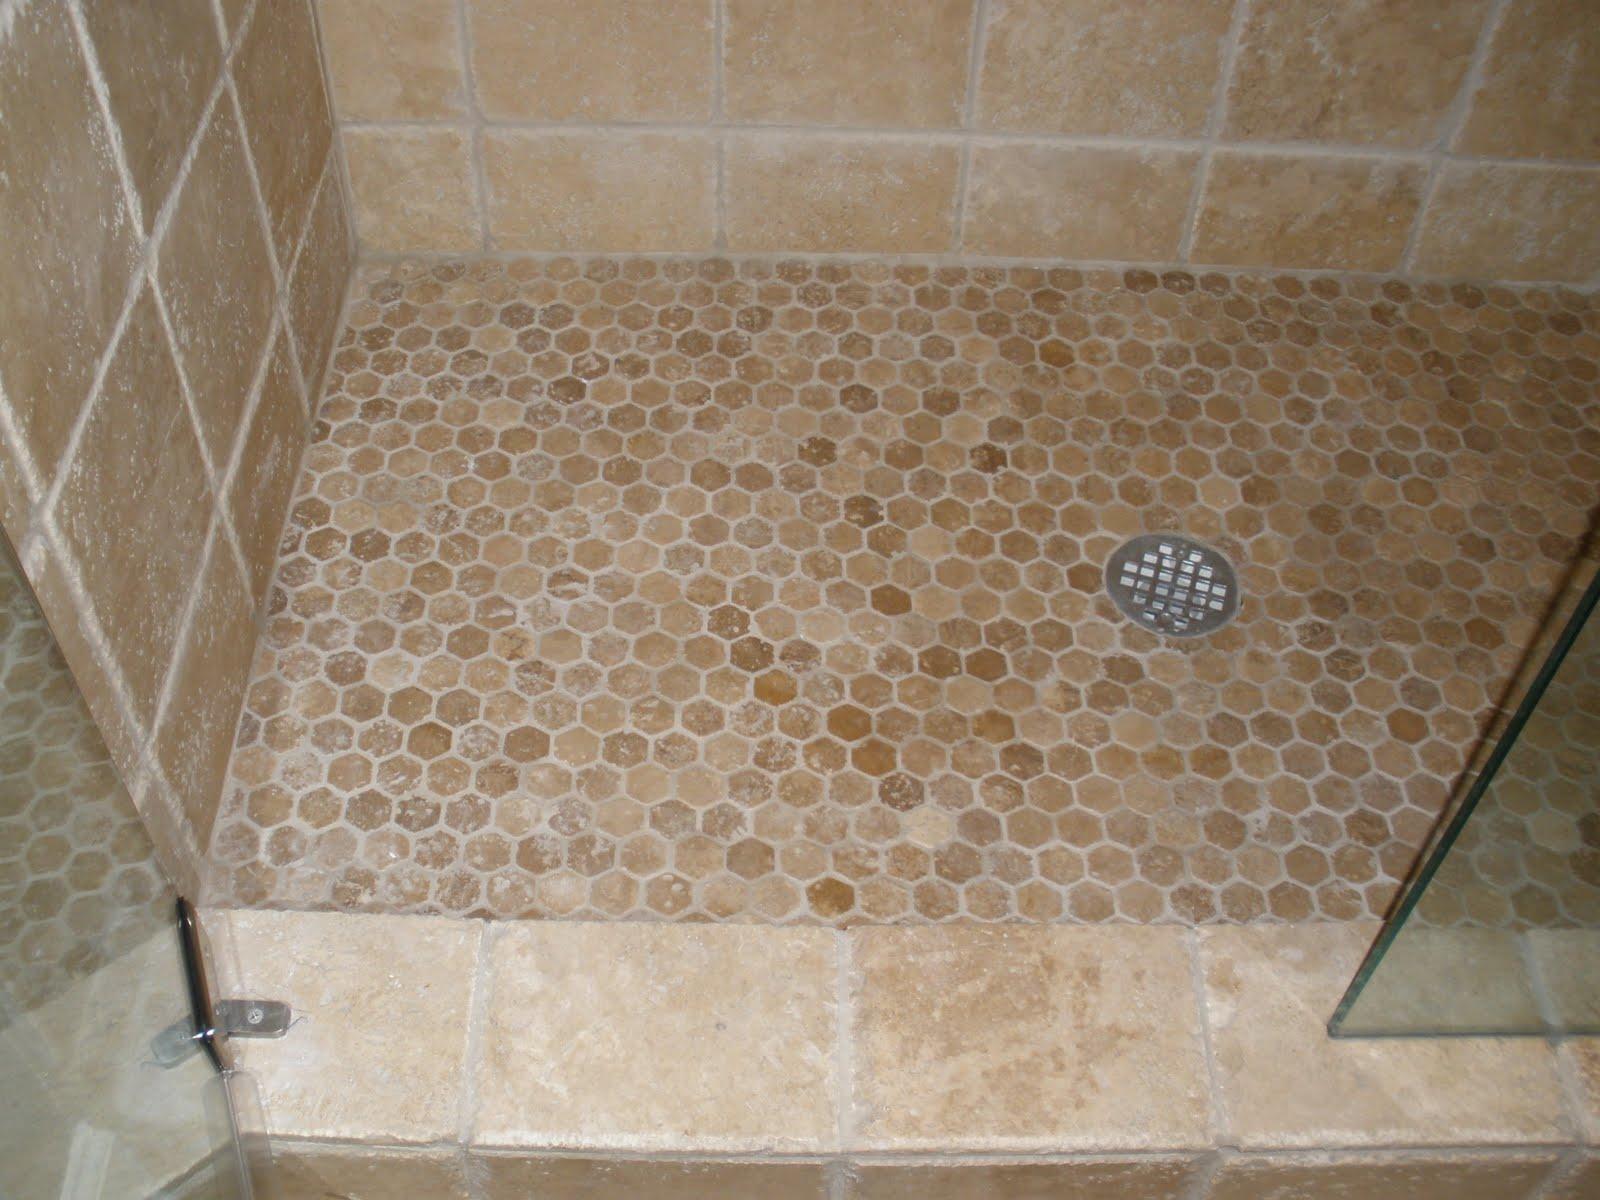 Lm Designs The Often Forgotten Shower Floor